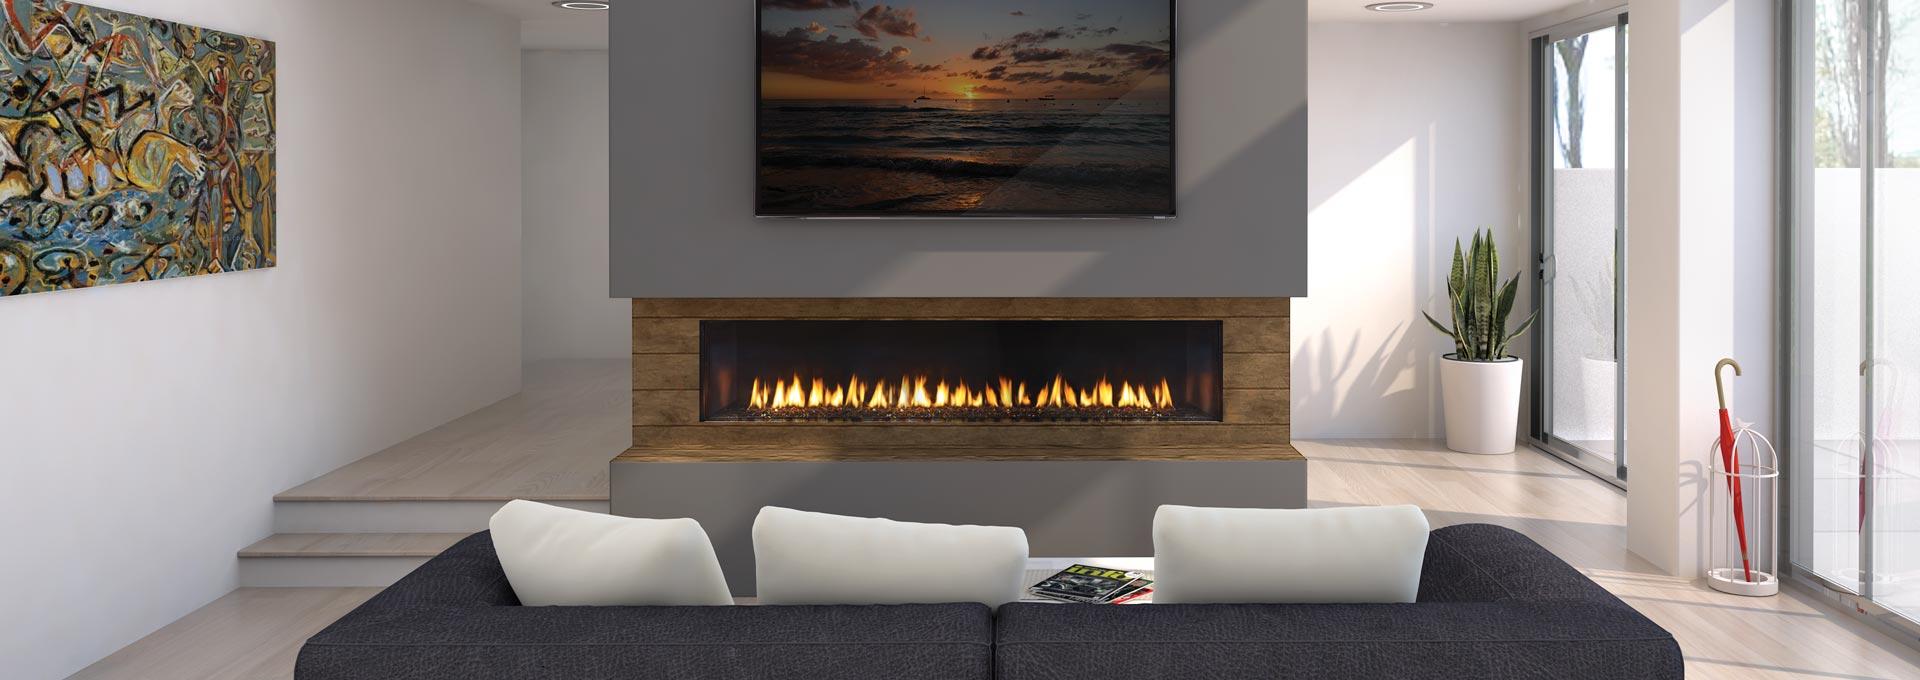 Regency city series new york view 72 modern gas fireplace for Modern gas fireplace price